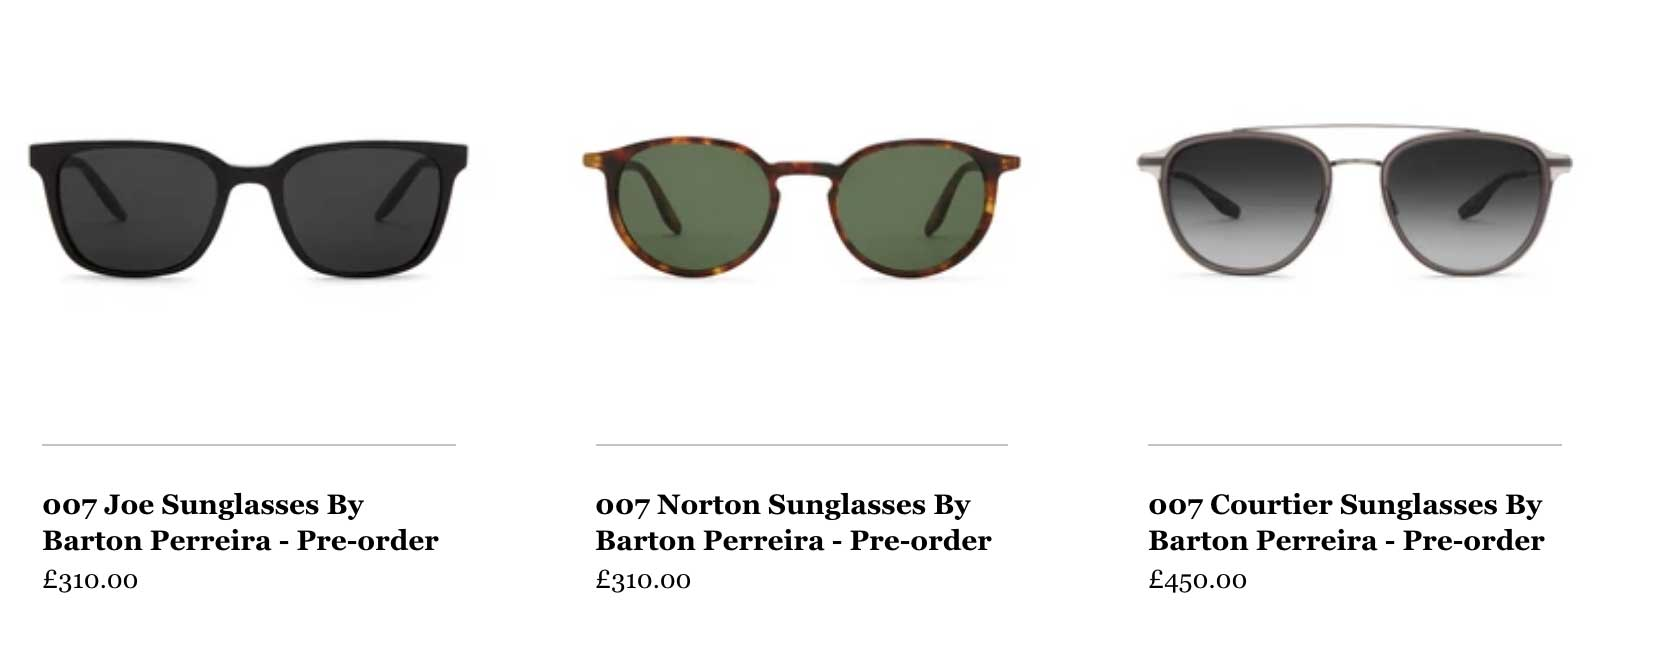 007 Sunglasses